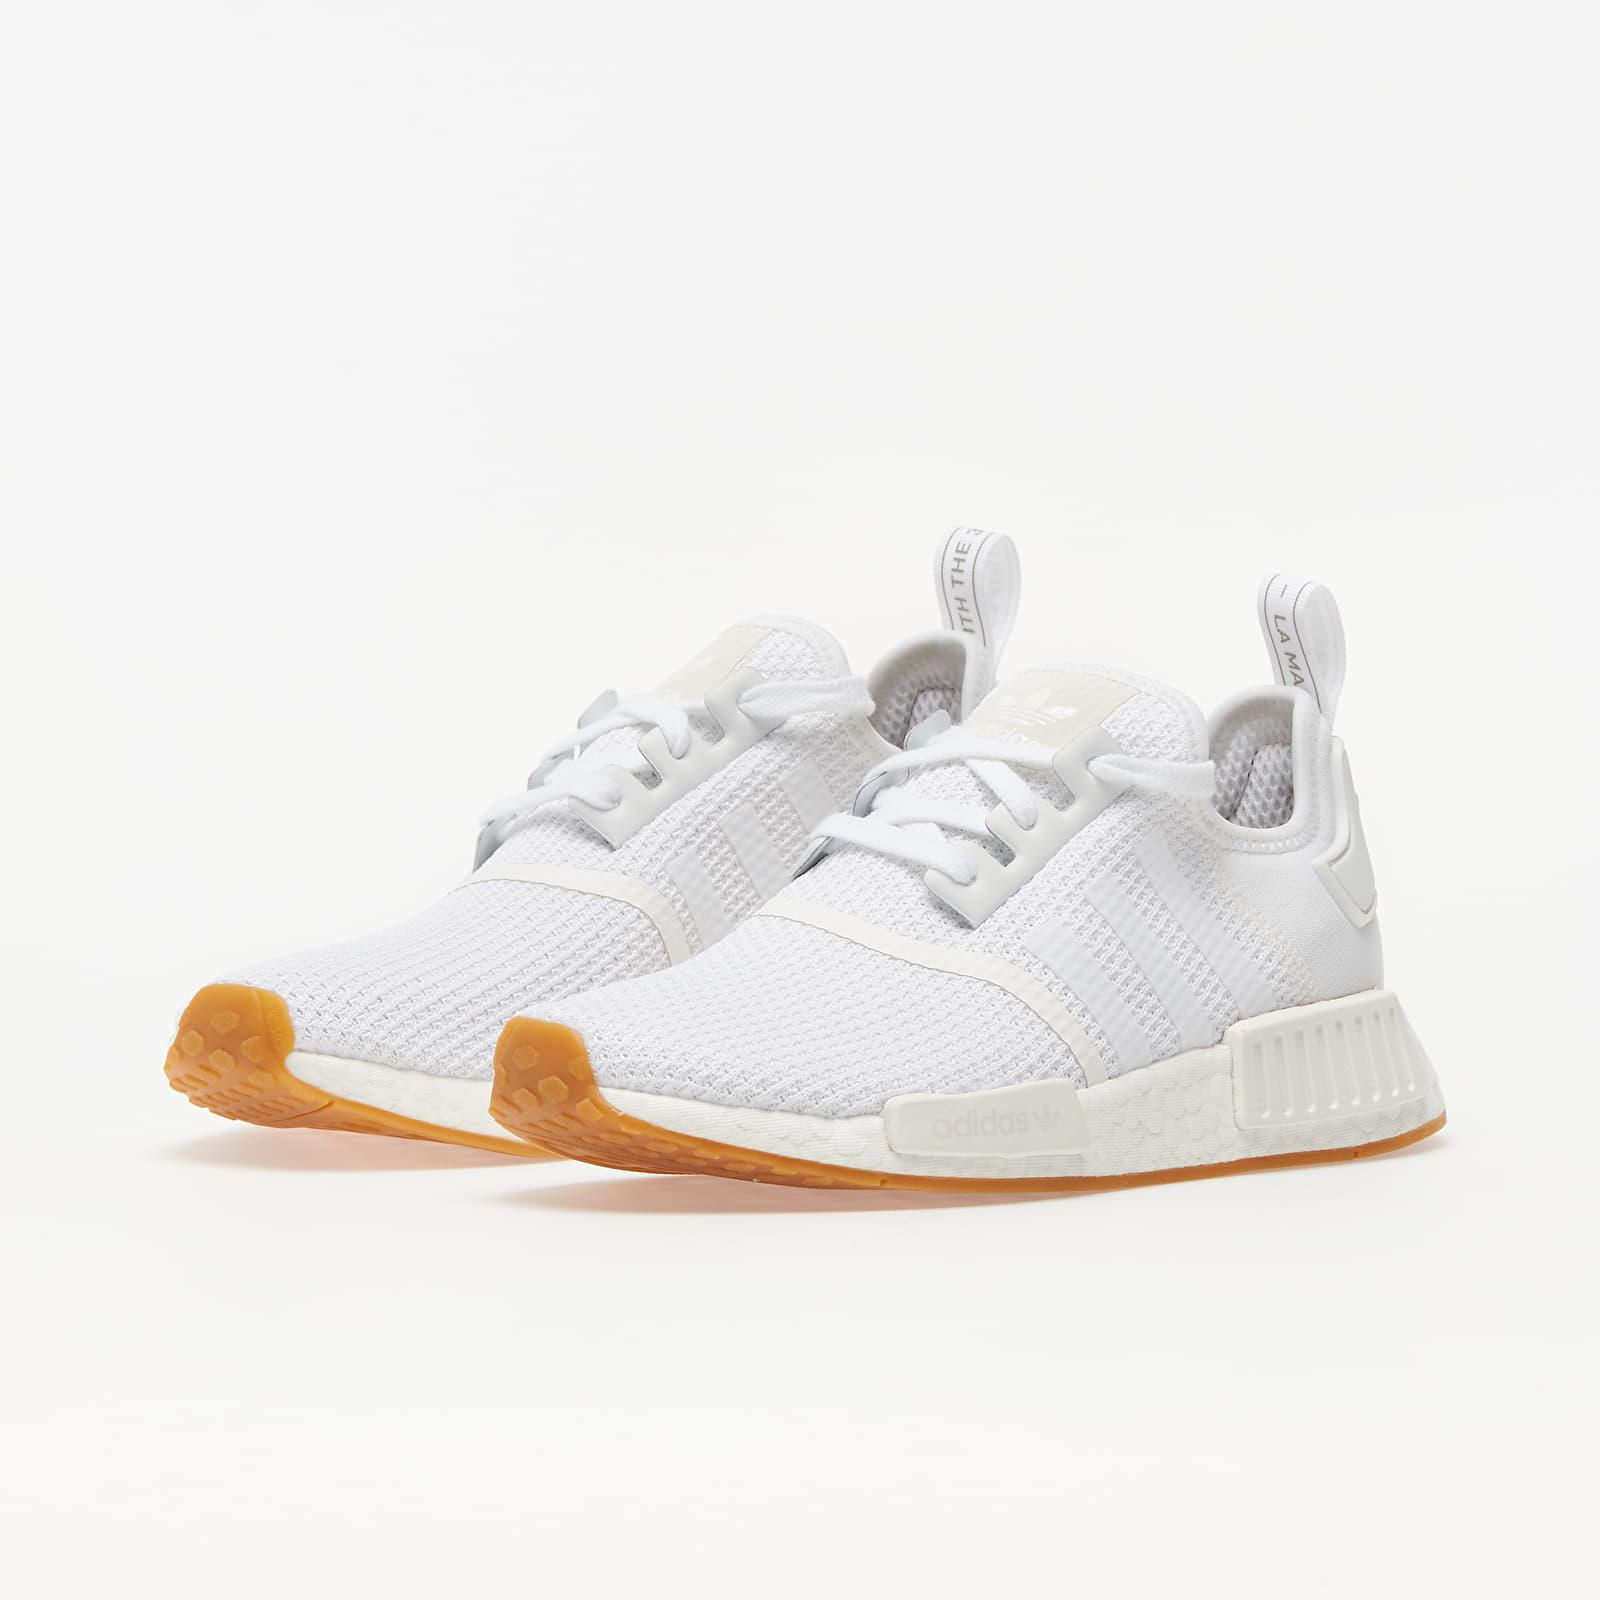 adidas NMD_R1 Ftw White/ Ftw White/ Gum 3 EUR 40